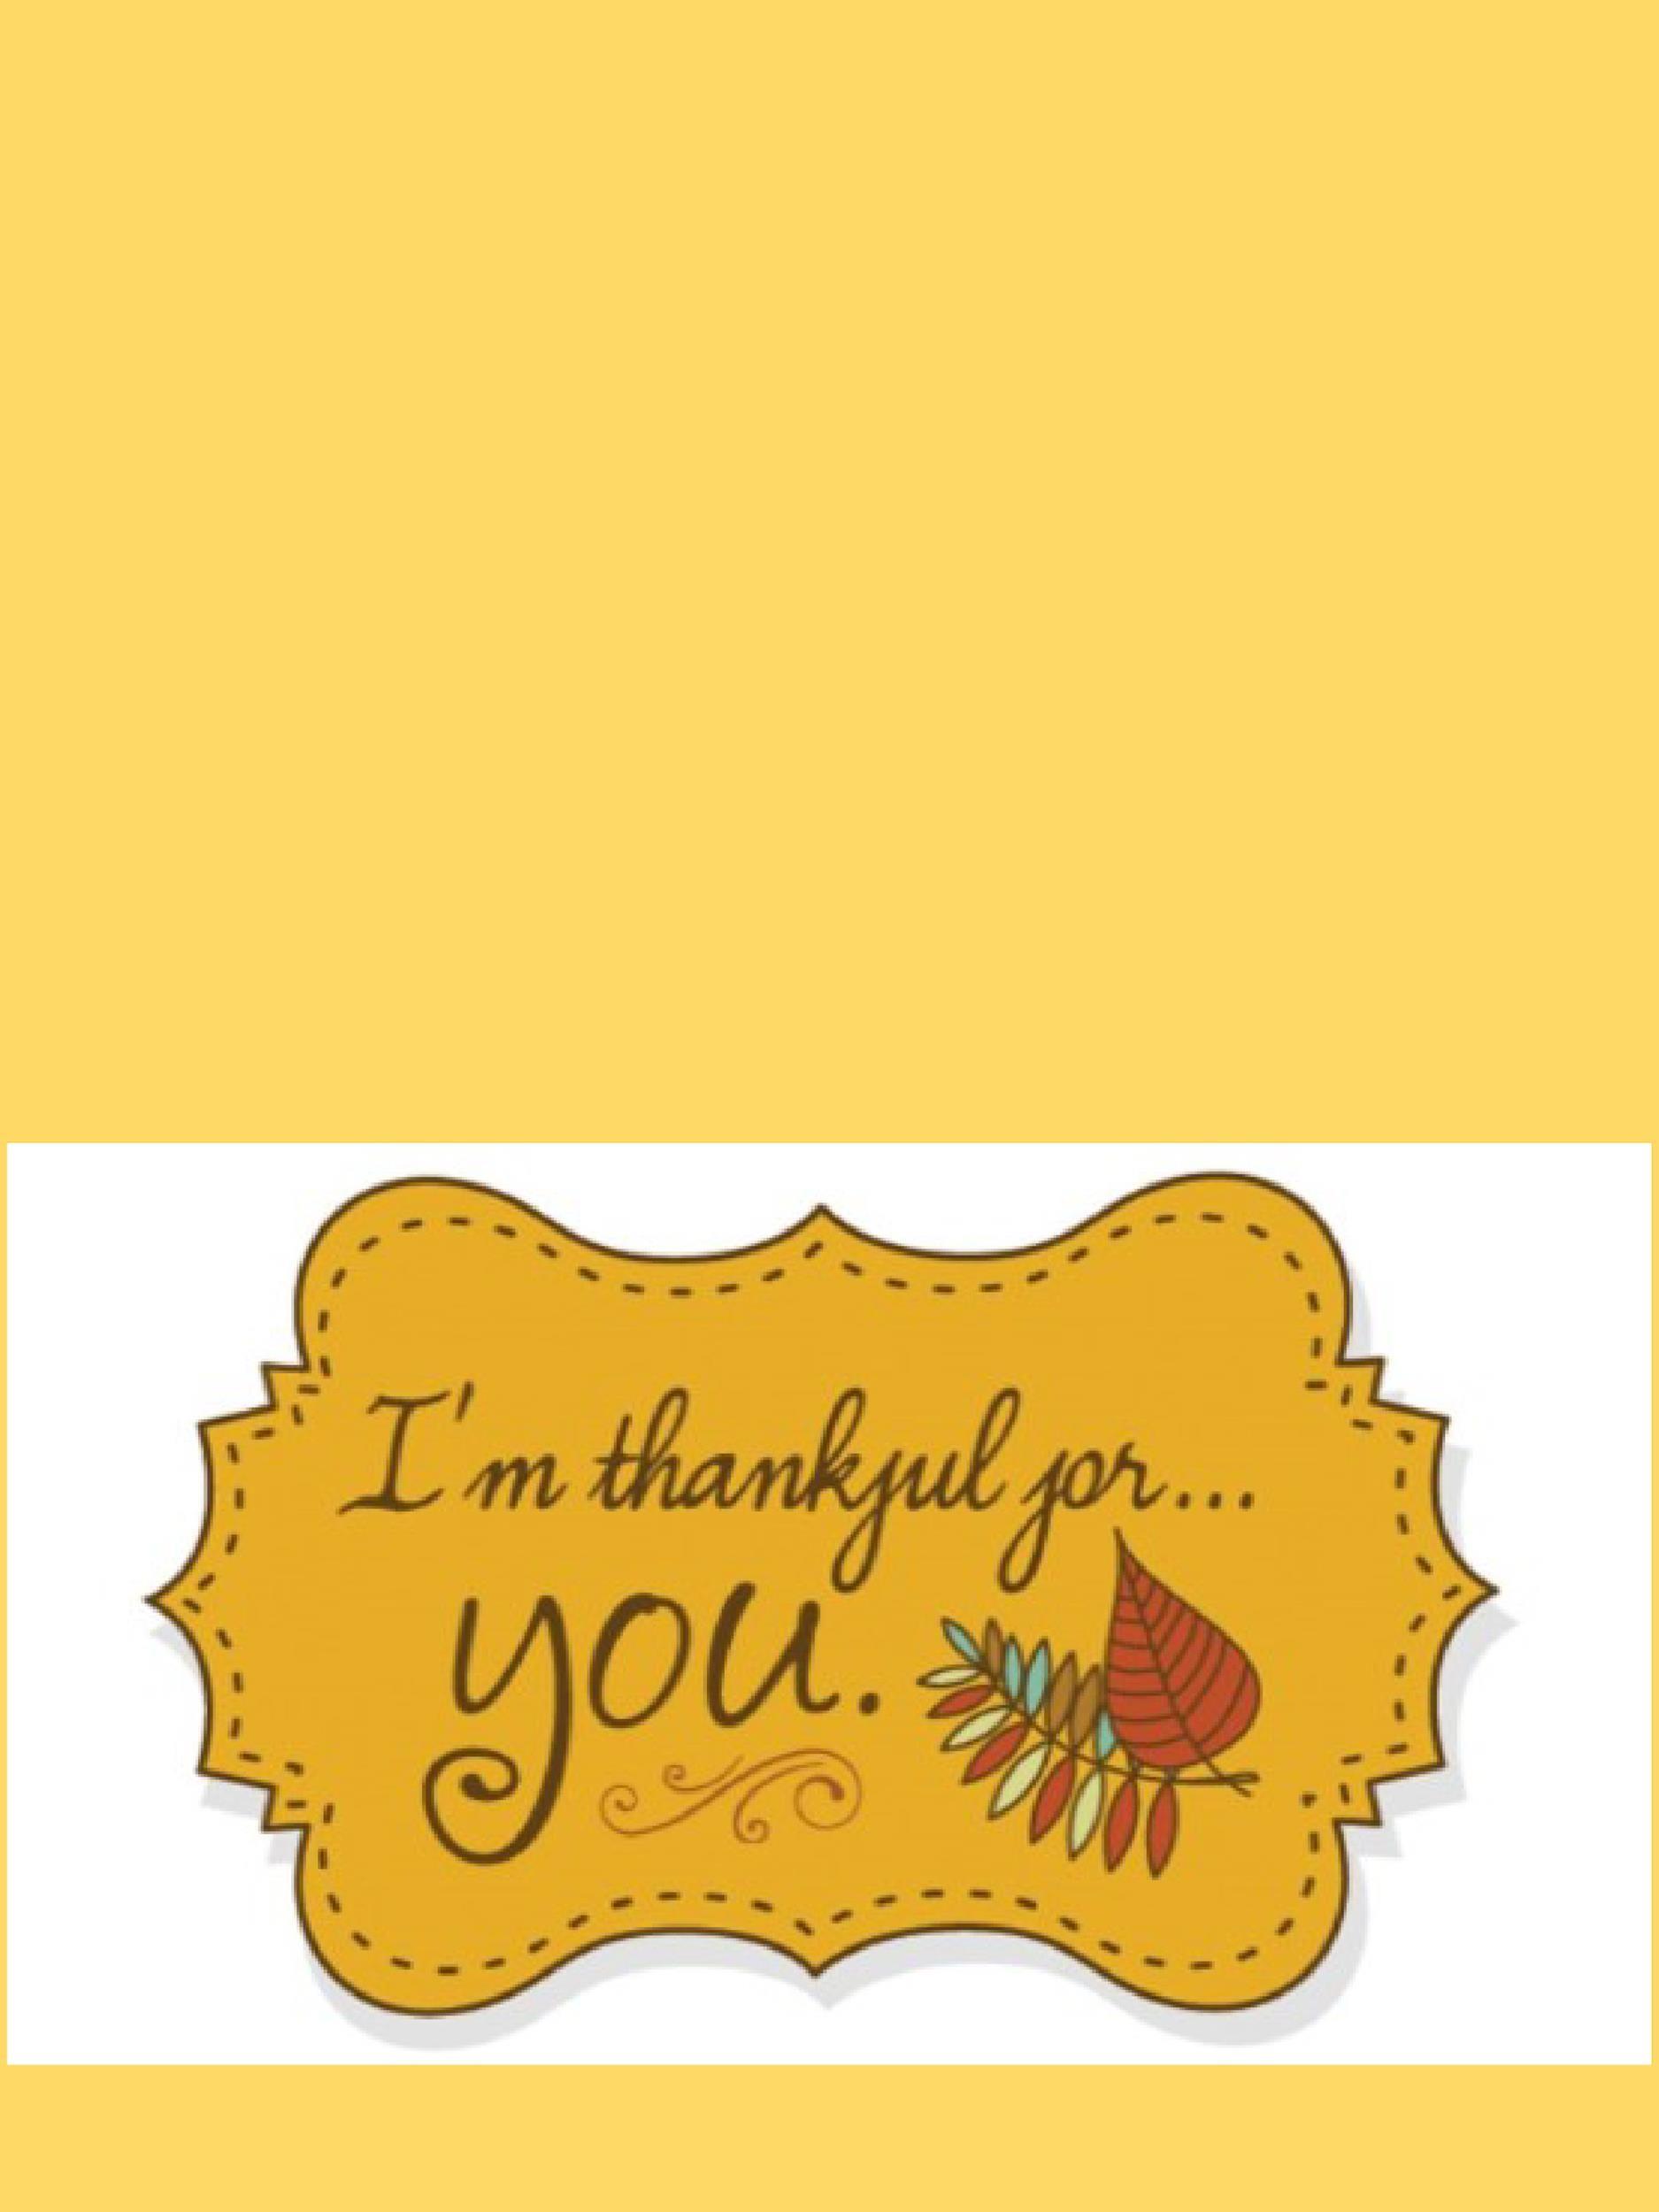 30+ Free Printable Thank You Card Templates (Wedding, Graduation - free thank you cards